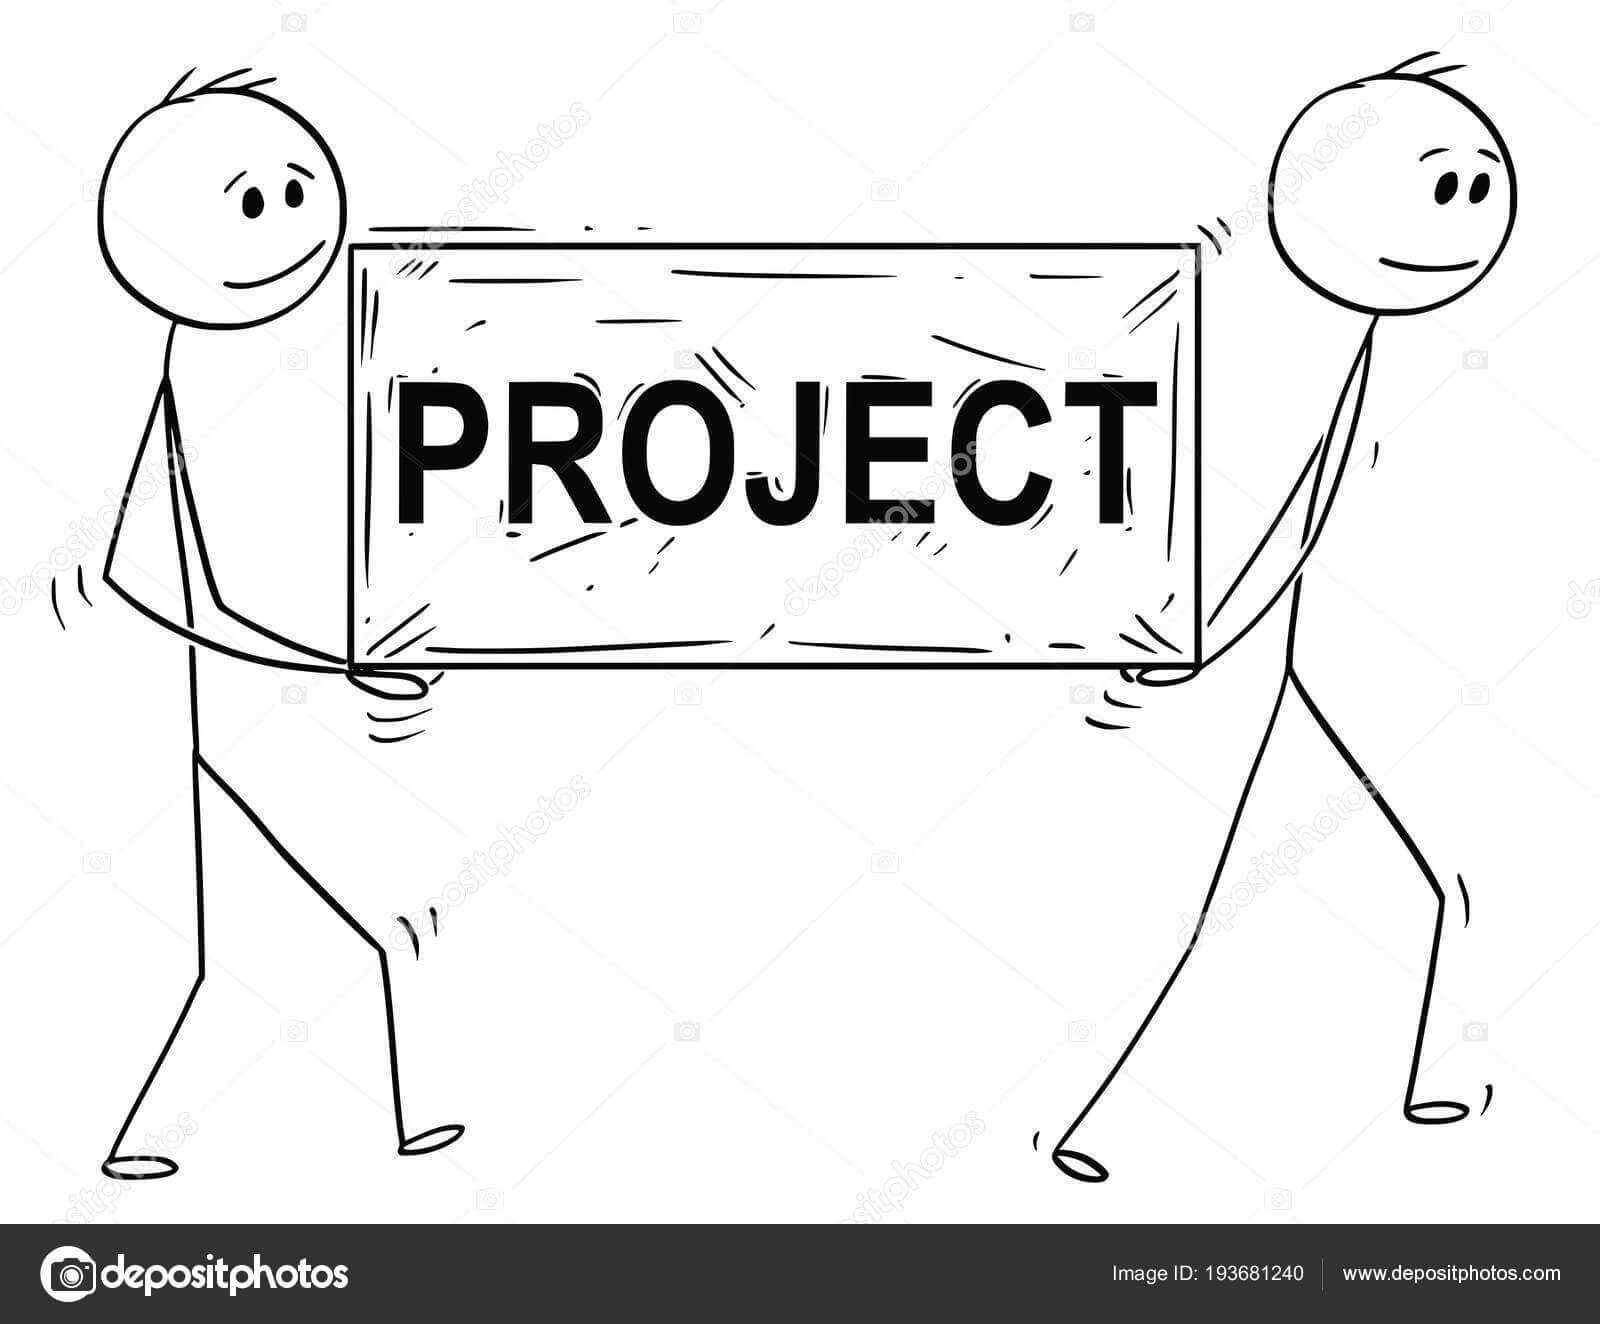 Online Ignou MARD project